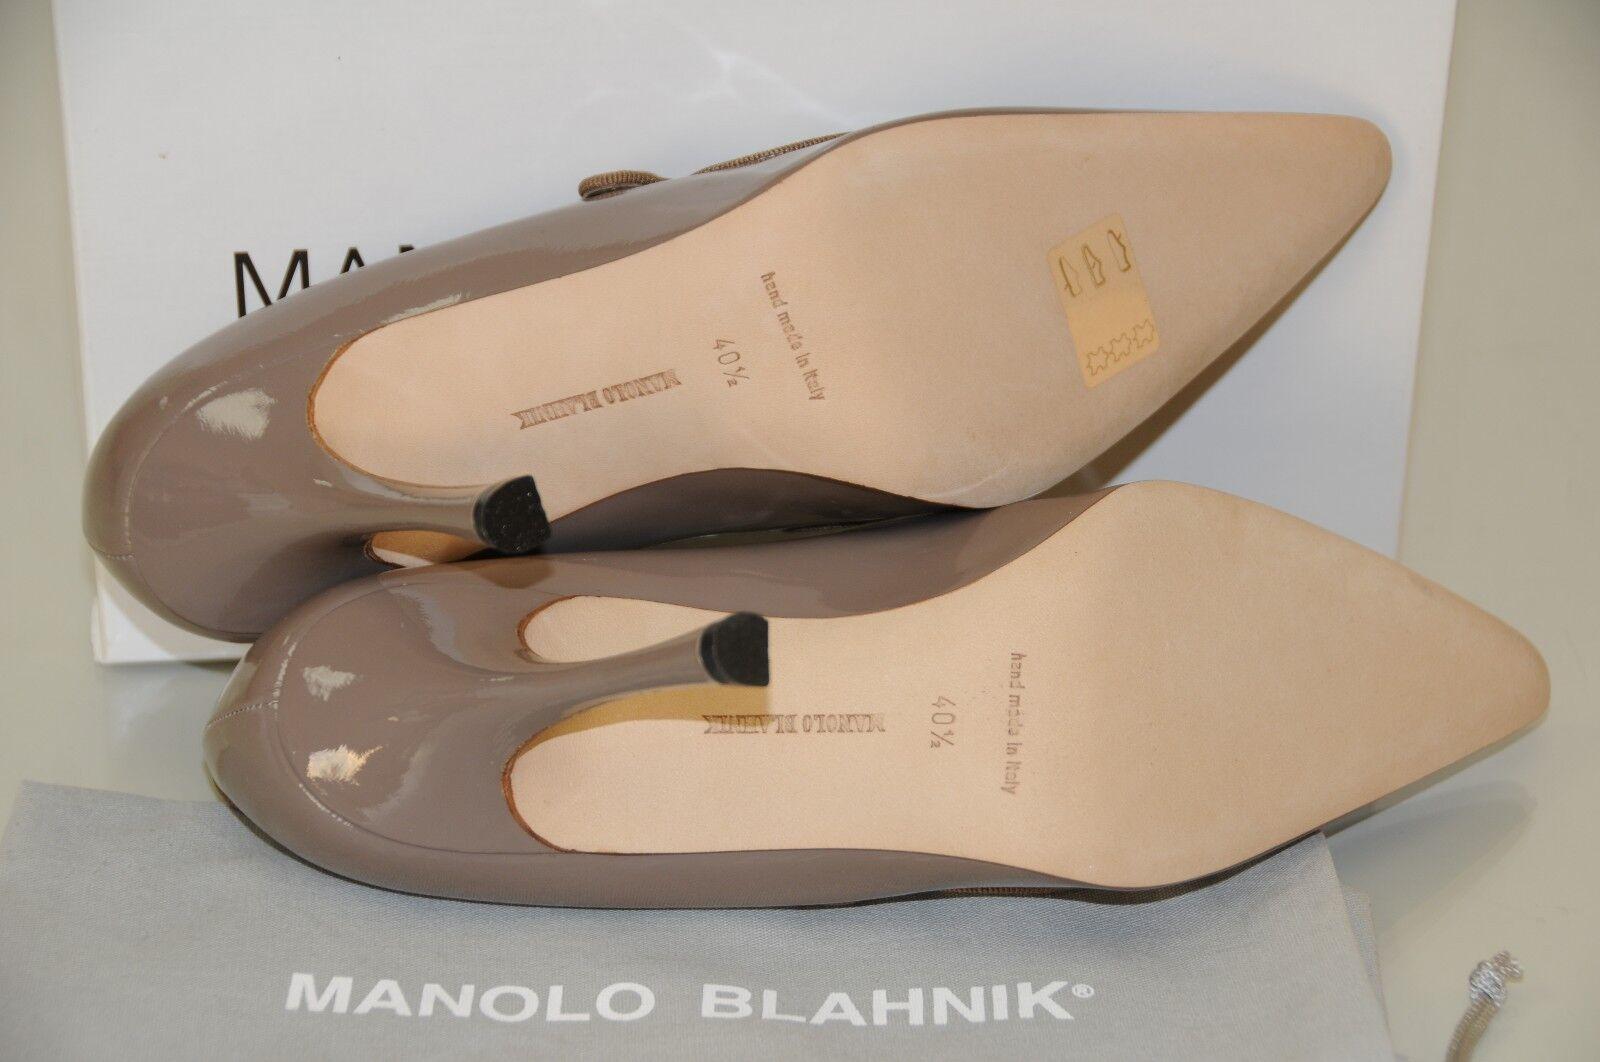 Neuf Femmeolo Blahnik Campari 40.5 Babies Gris Beige Chaussures Vernies 40.5 Campari 41 41.5 9273d3